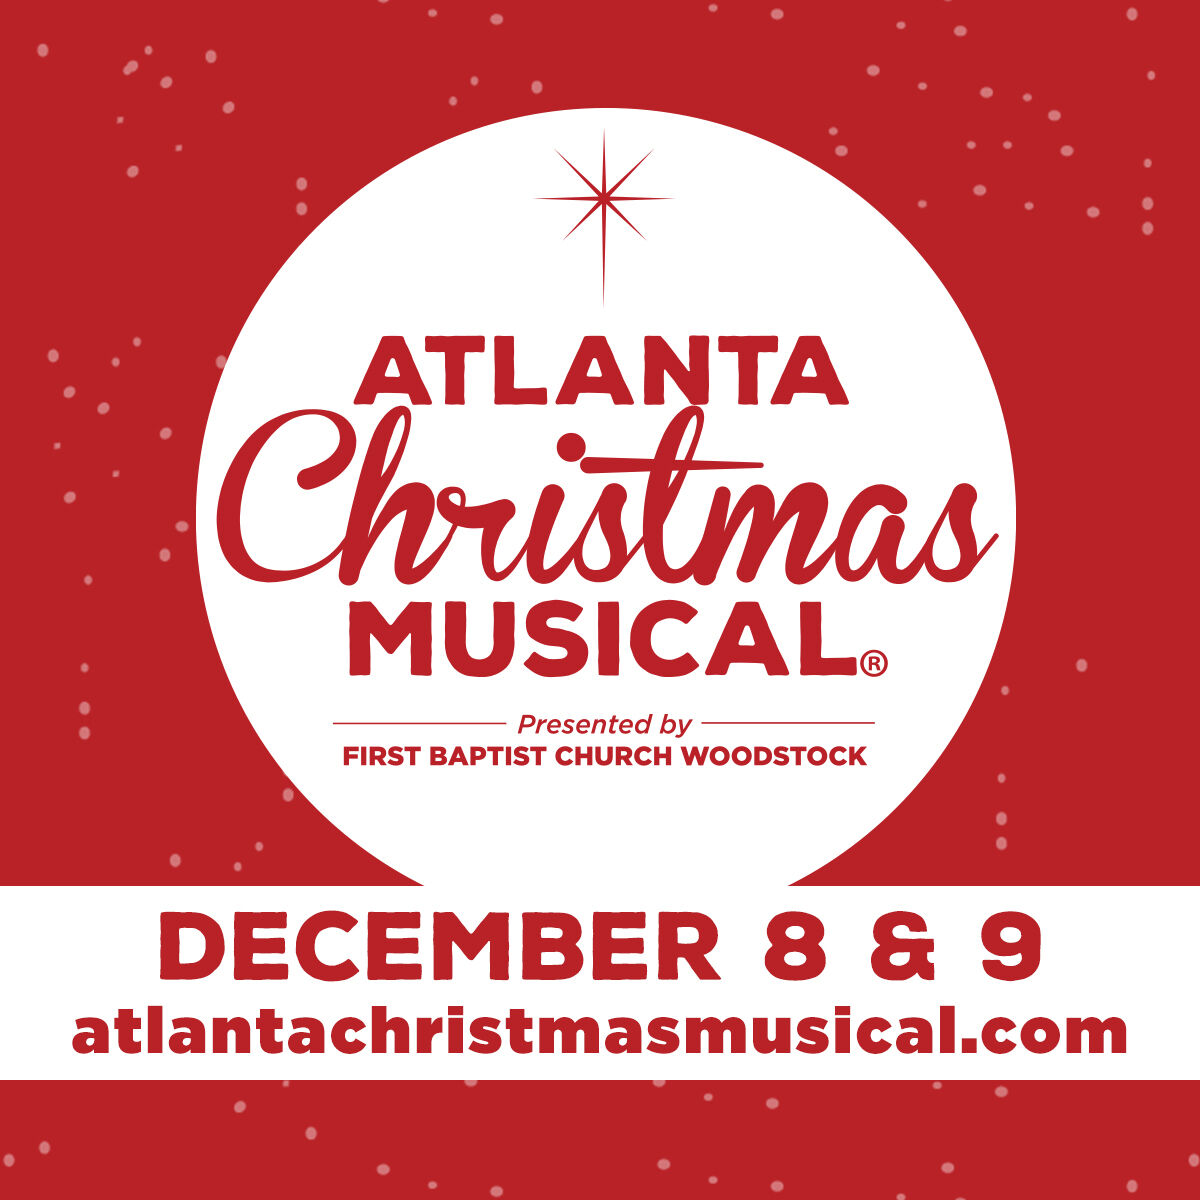 Atlanta Christmas Musical | FaithTalk Atlanta 970 - Atlanta, GA